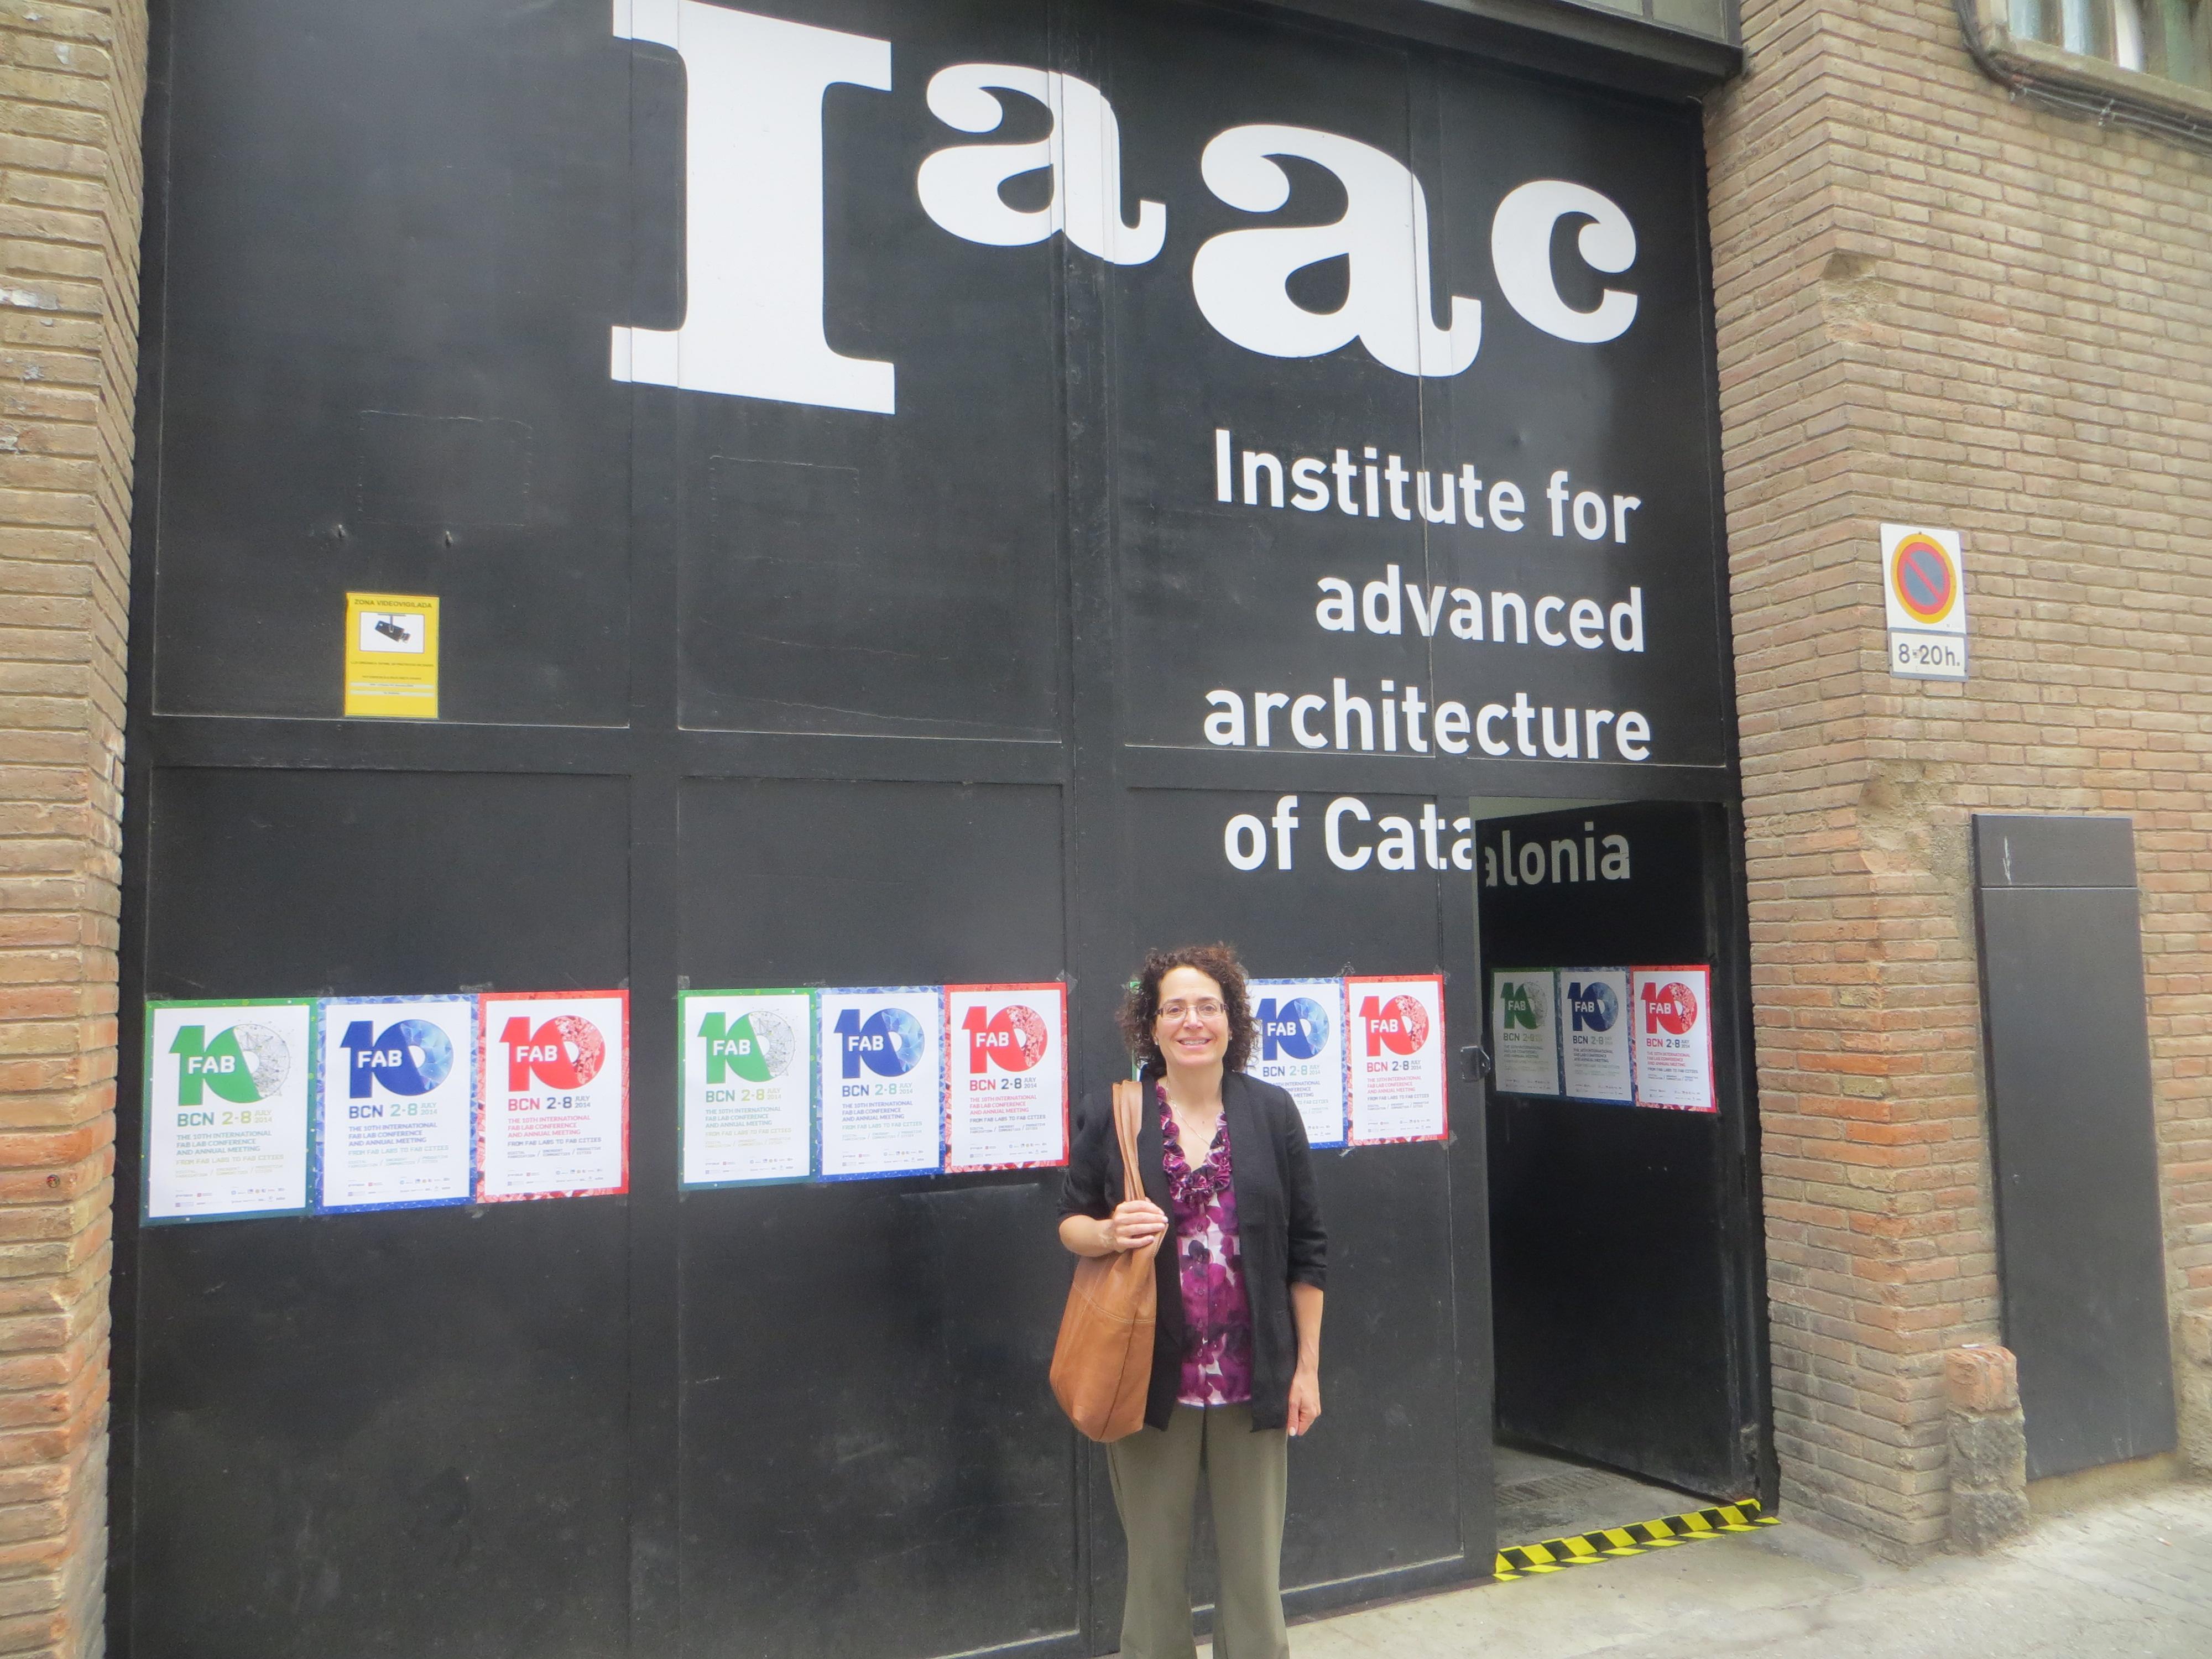 Fab Lab BCN – What's inside a great FAB LAB?